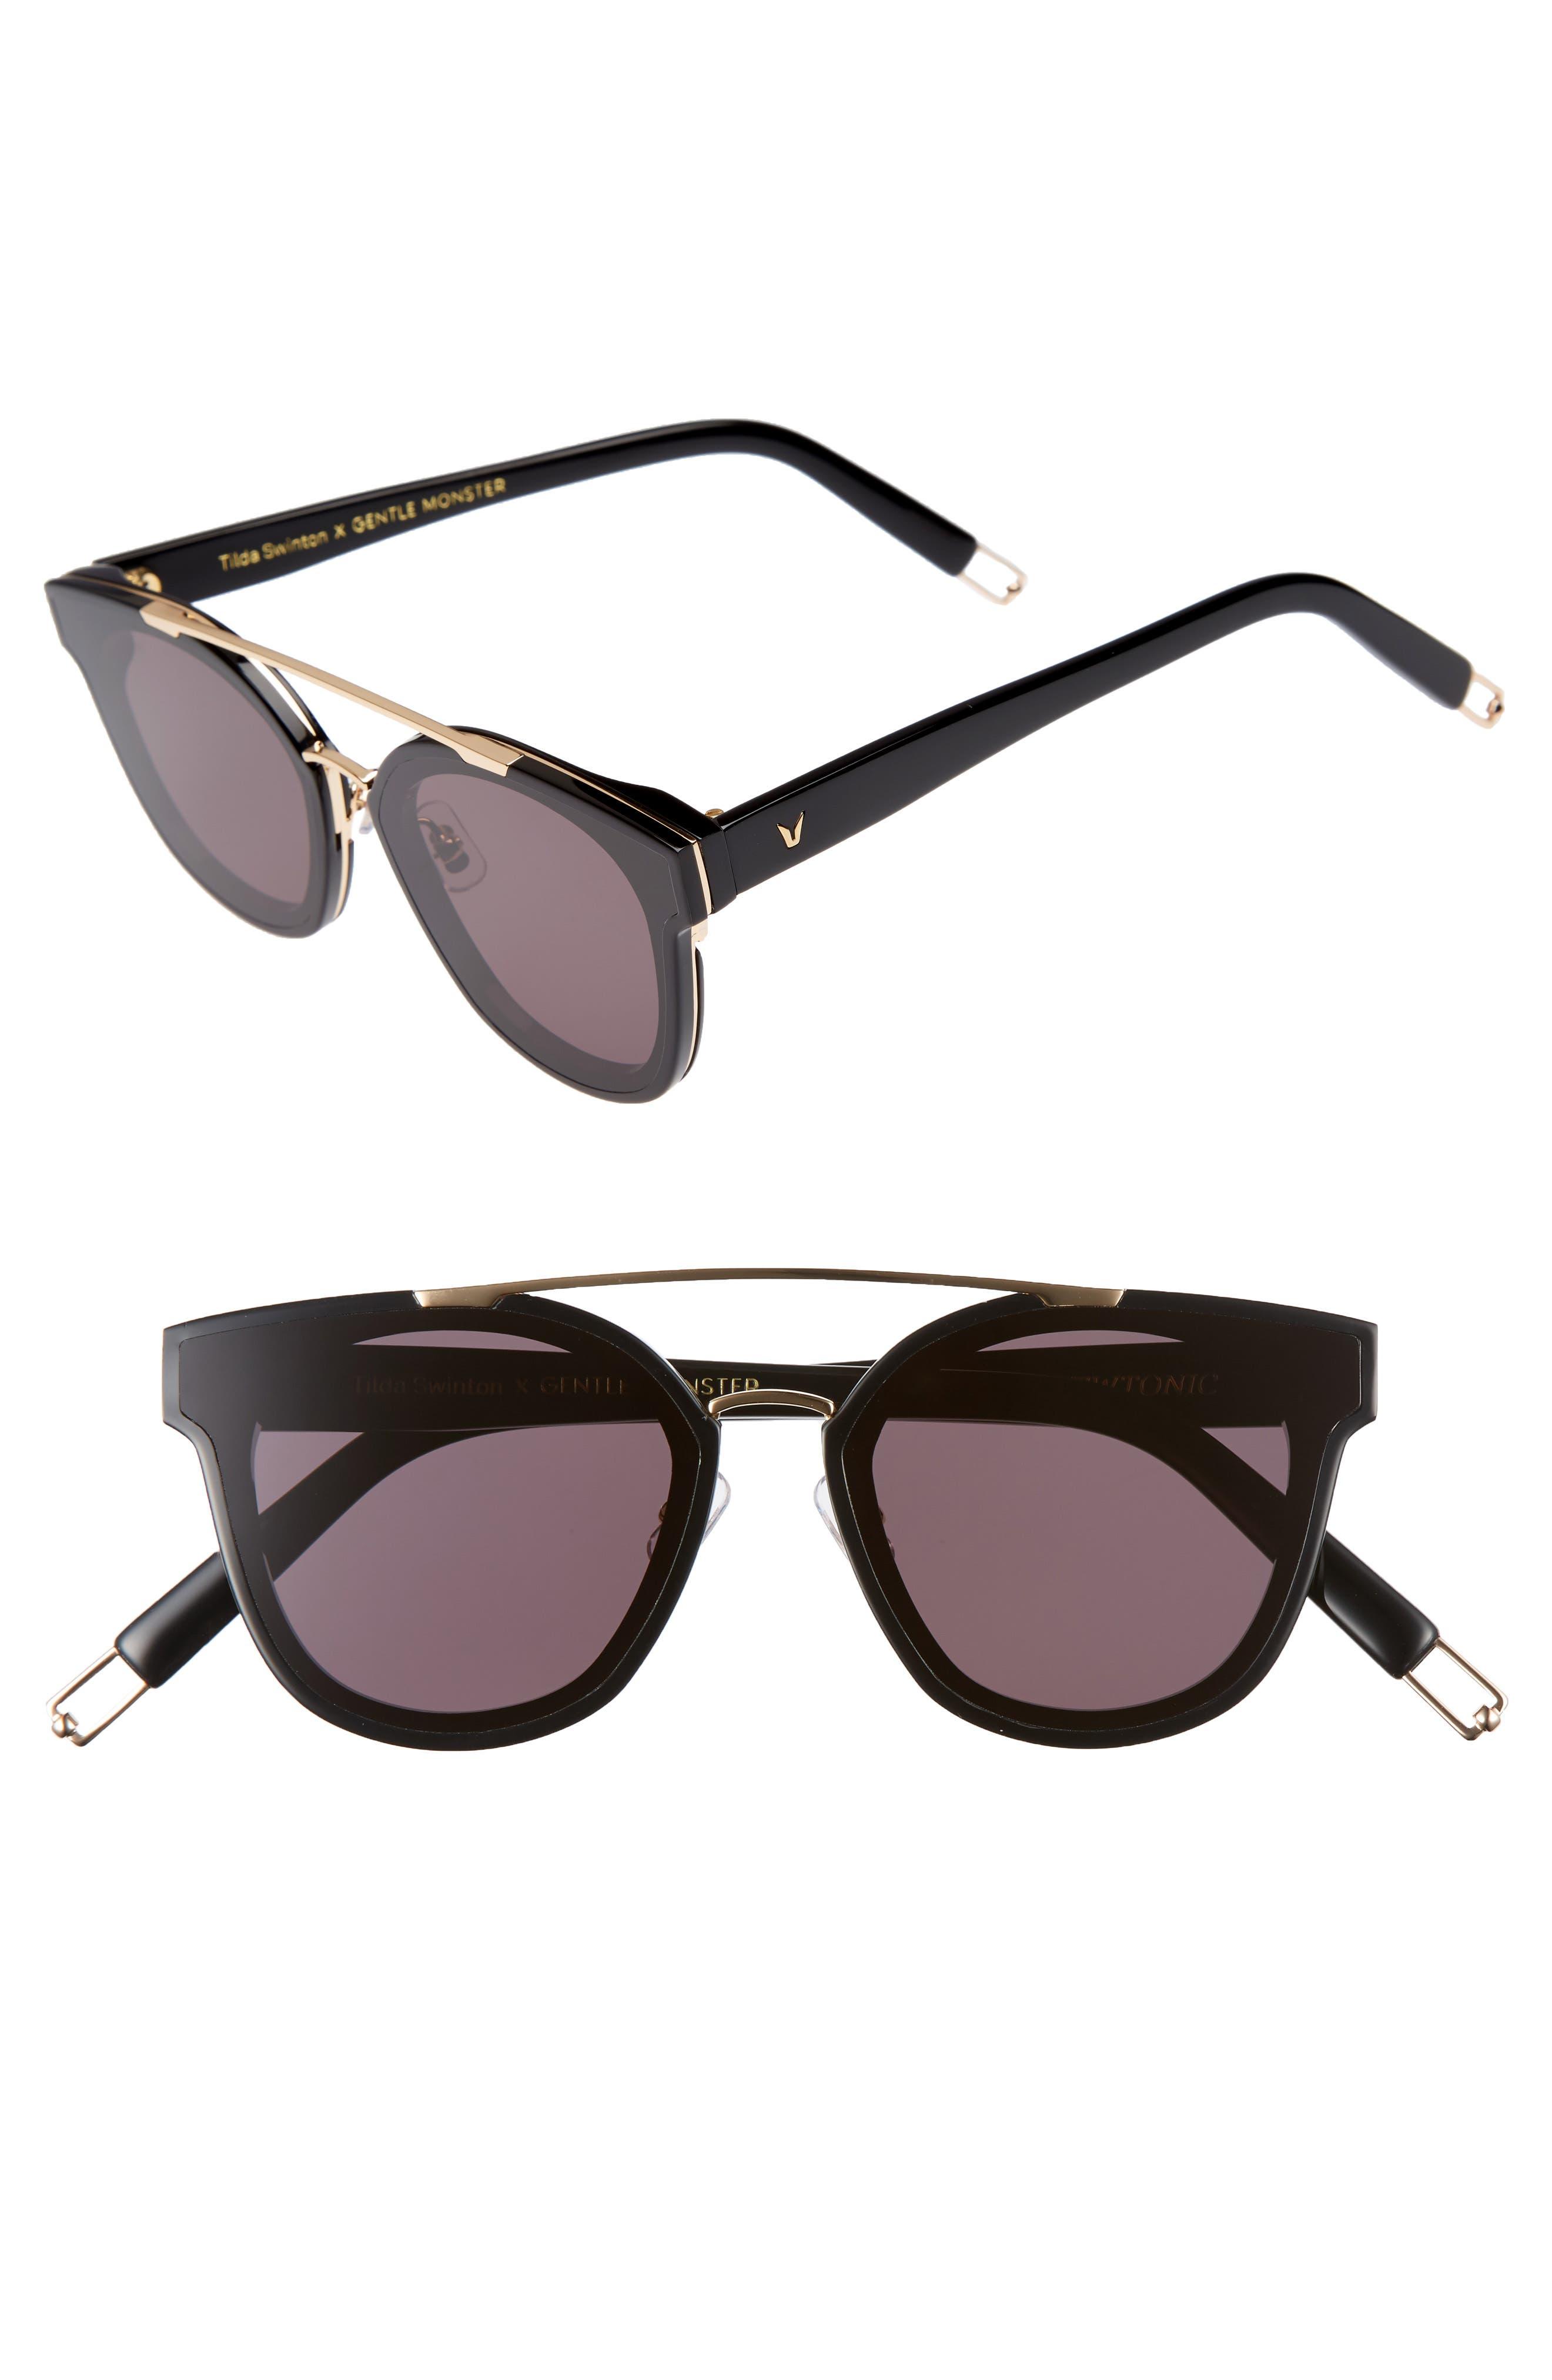 Tilda Swinton x Gentle Monster Newtonic 60mm Rounded Sunglasses,                             Main thumbnail 1, color,